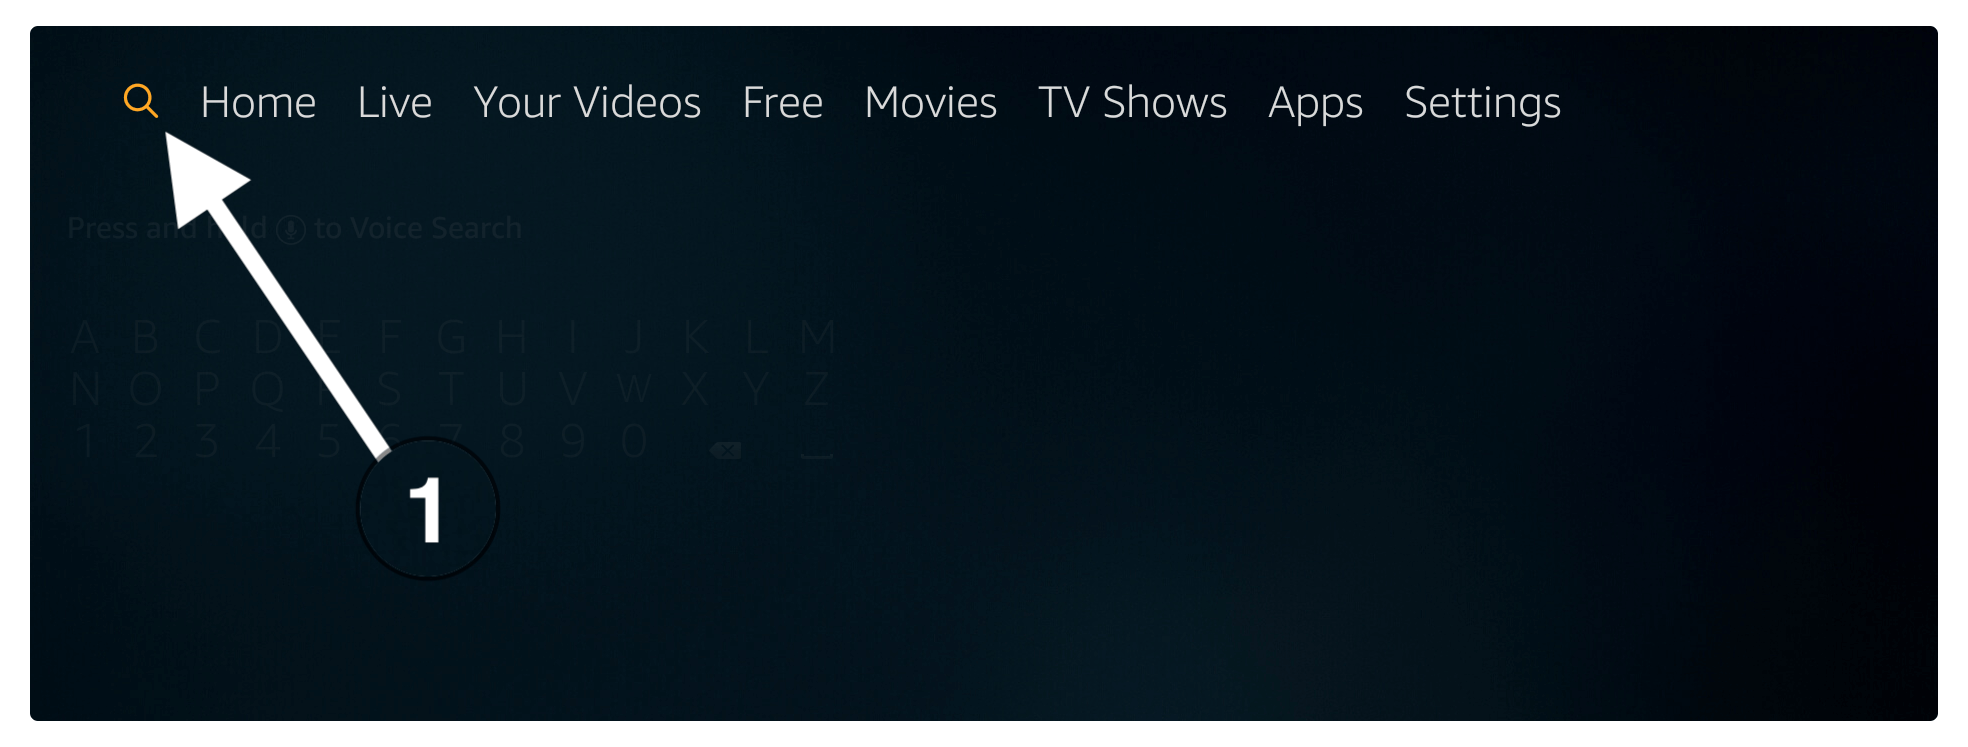 install-TVTap-on-Firestick